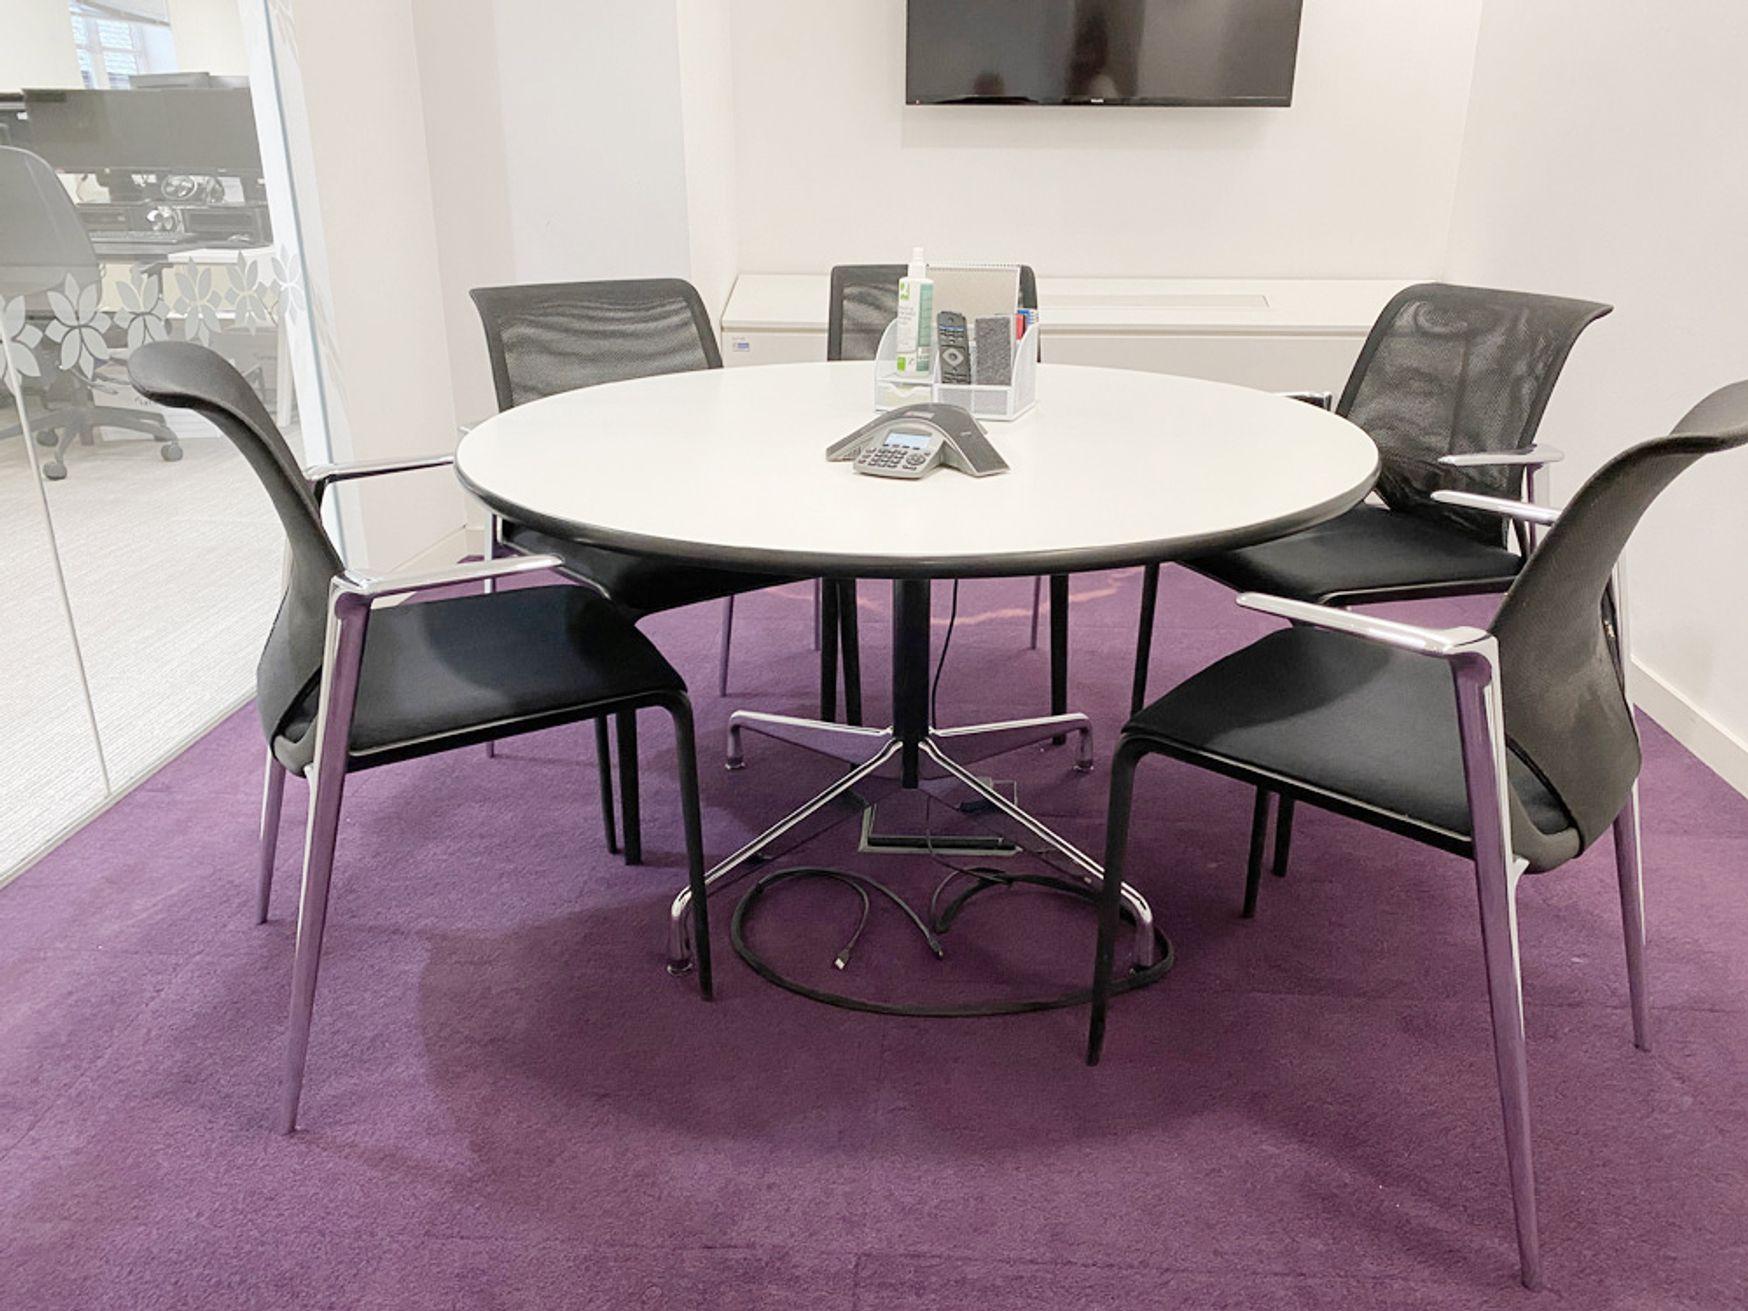 Used Vitra/Eames 'Segmented Table' with white laminate top, black edge.